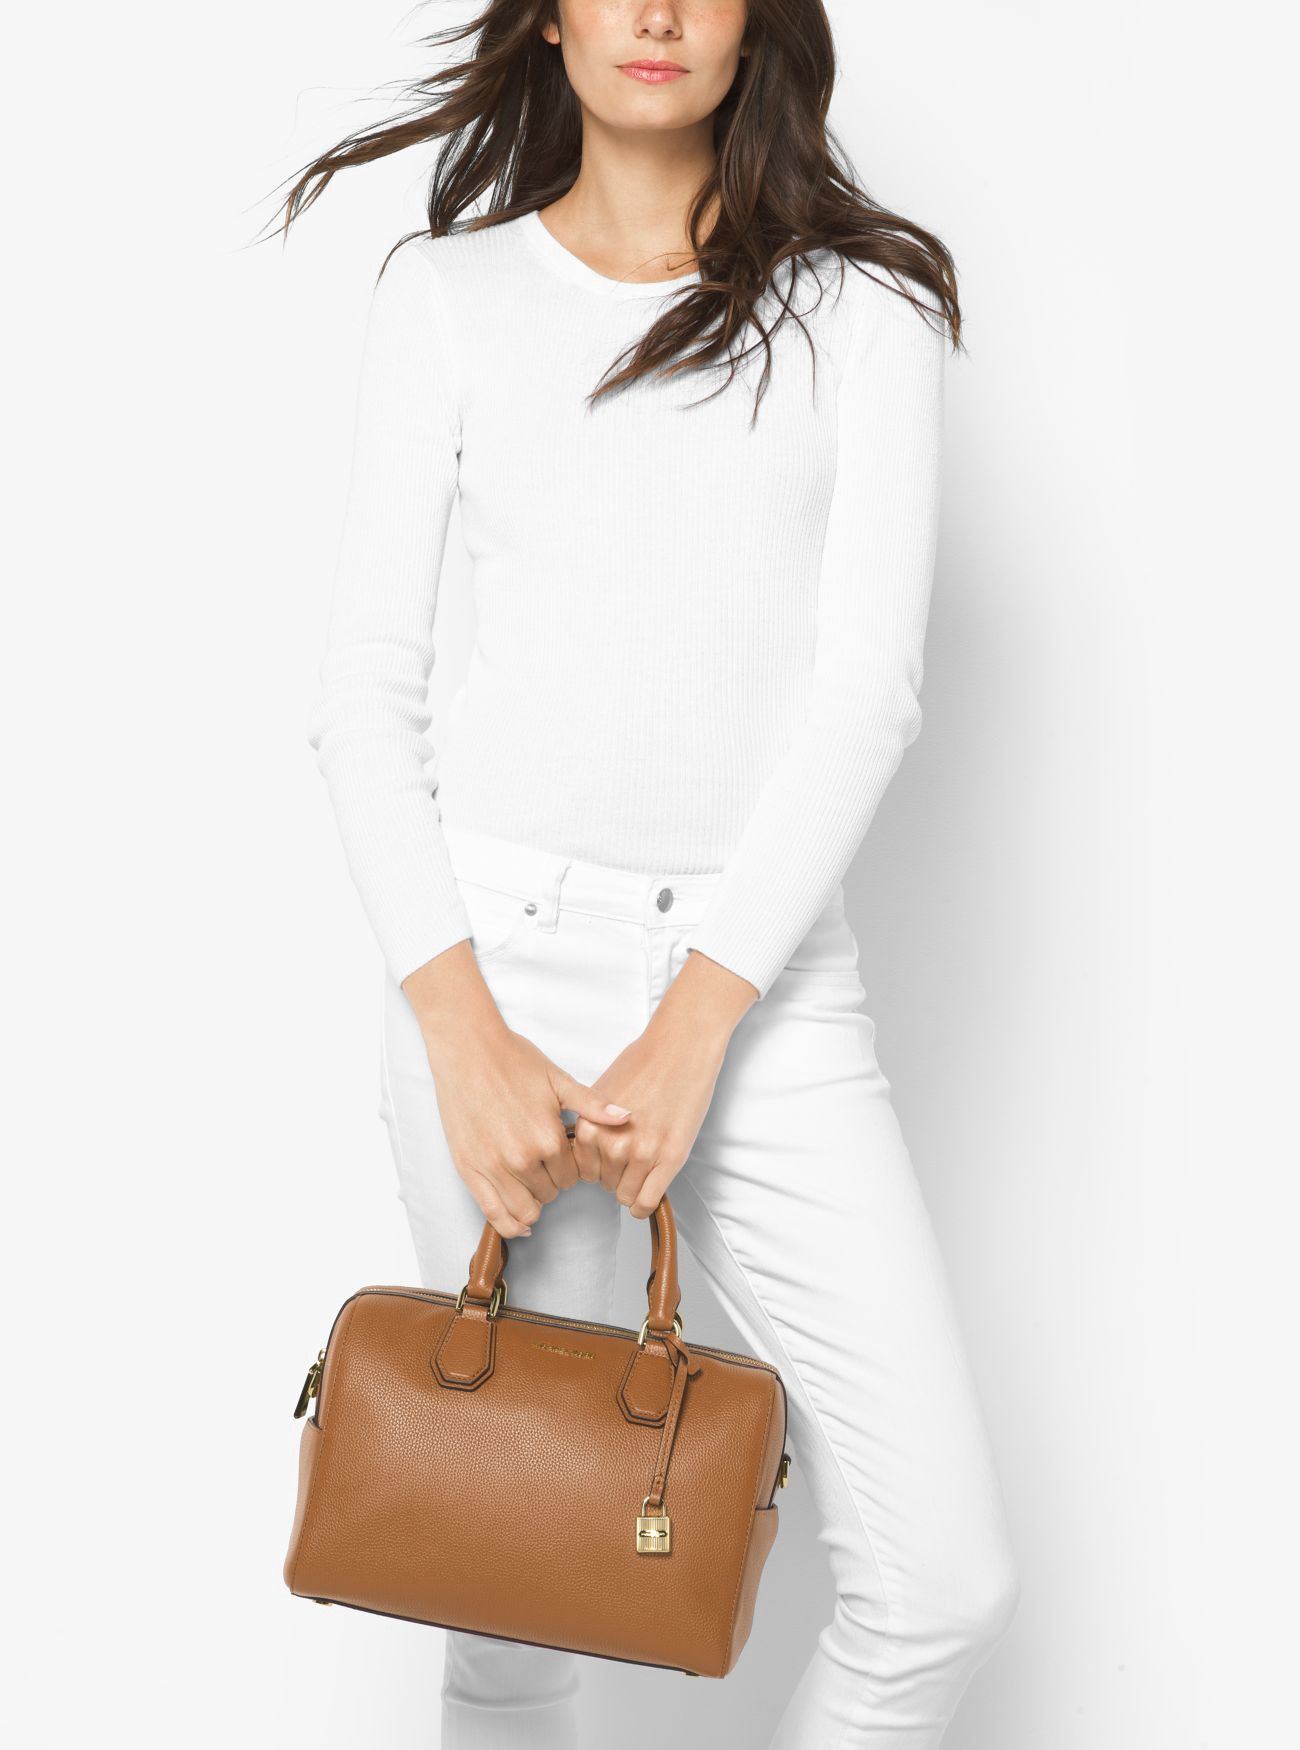 MICHAEL KORS Mercer Medium Leather Duffel.  michaelkors  bags  shoulder bags   hand bags  polyester  leather  lining   0c7fe4563c